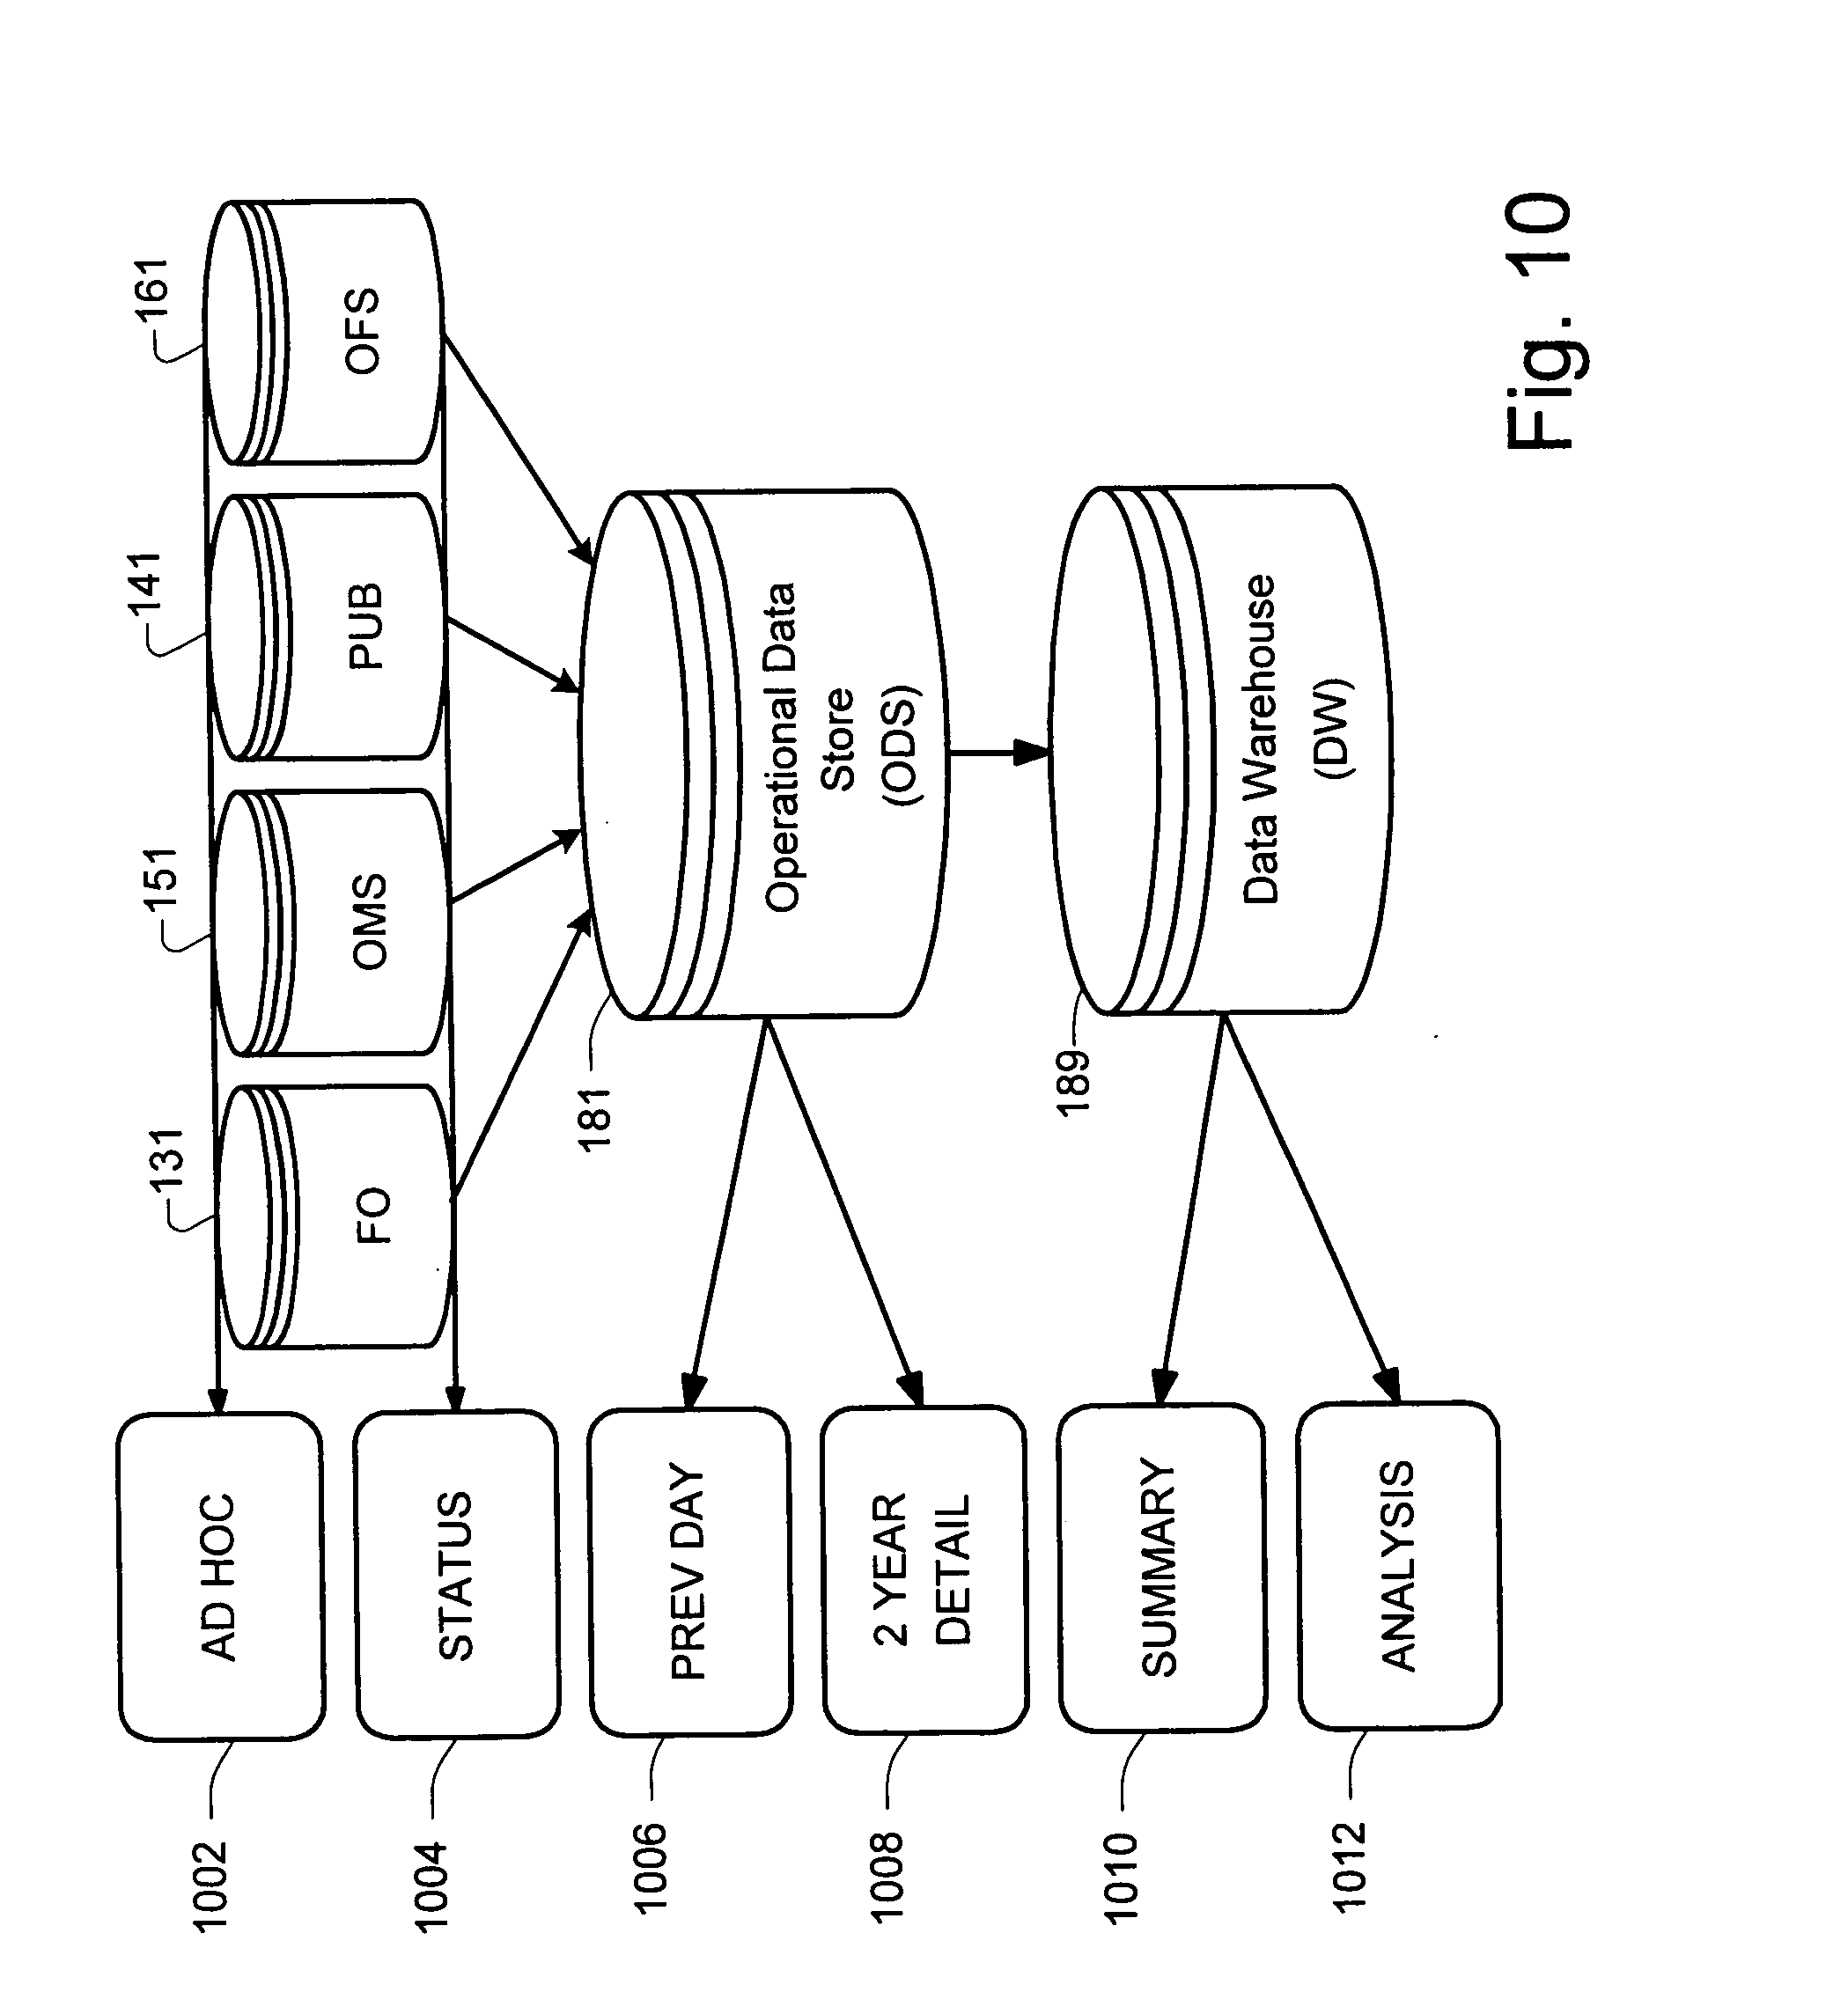 1004 Sterling 15a Wiring Diagrams Detailed Heater Schematic Diagram Schematics